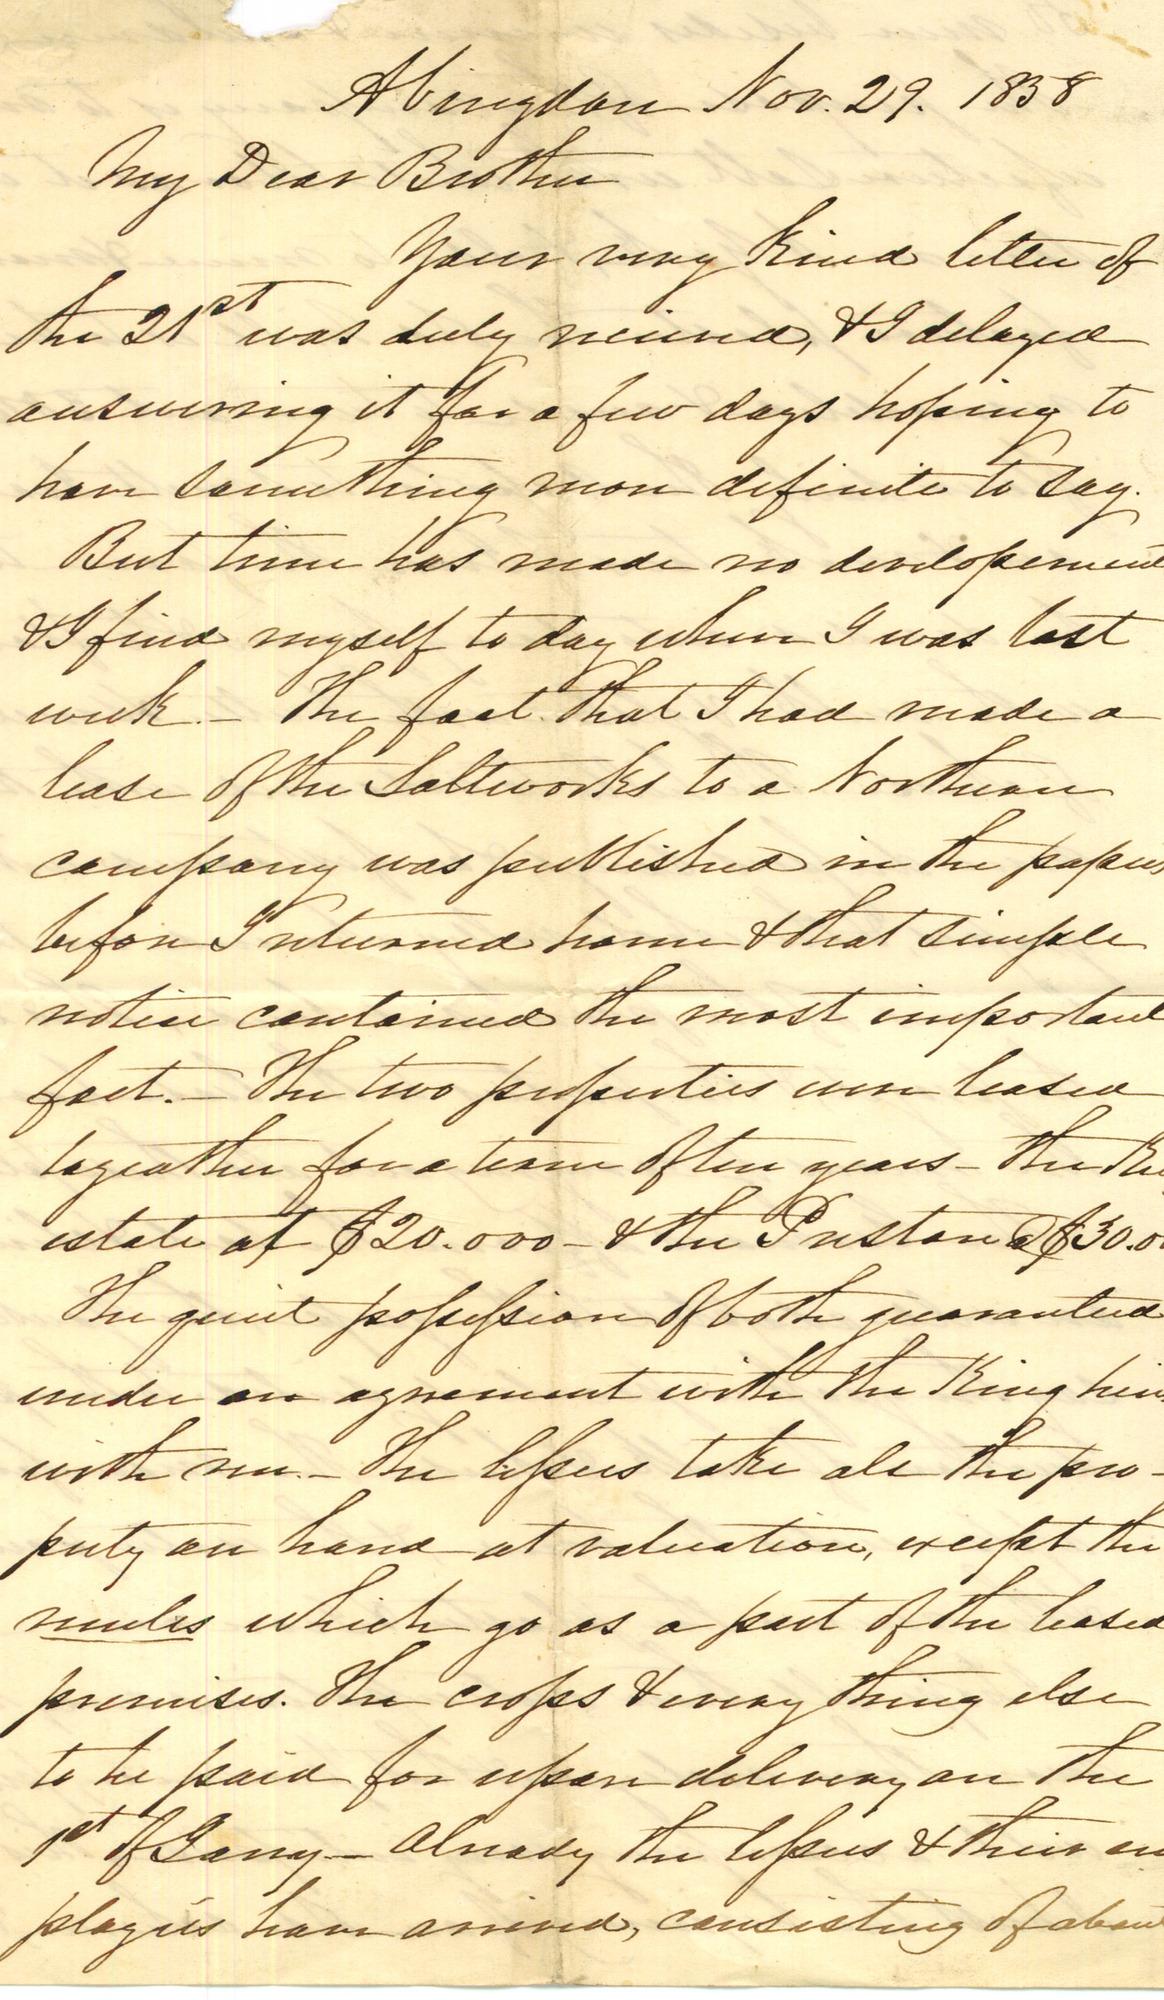 Ms1997_002_SmithfieldPreston_Letter_1838_1129a.jpg